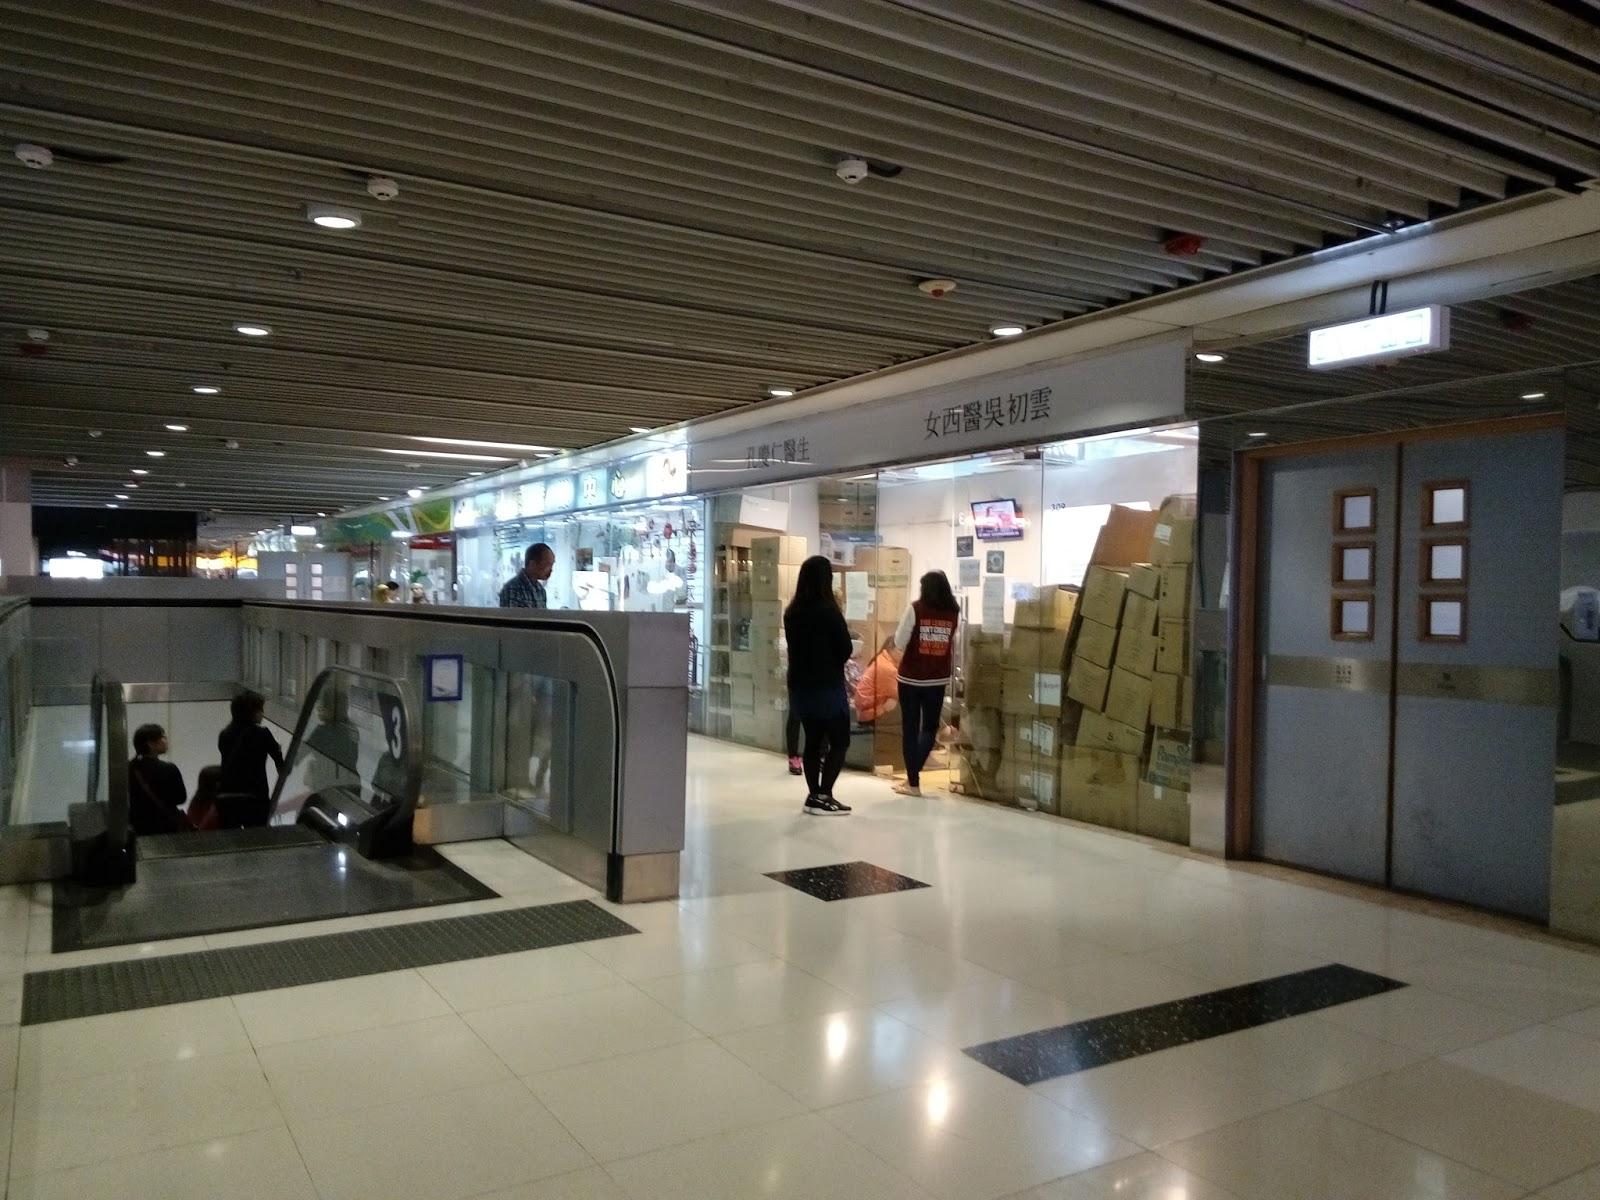 Grassroots O2: [領展商場] 天澤商場 @2017-04-22